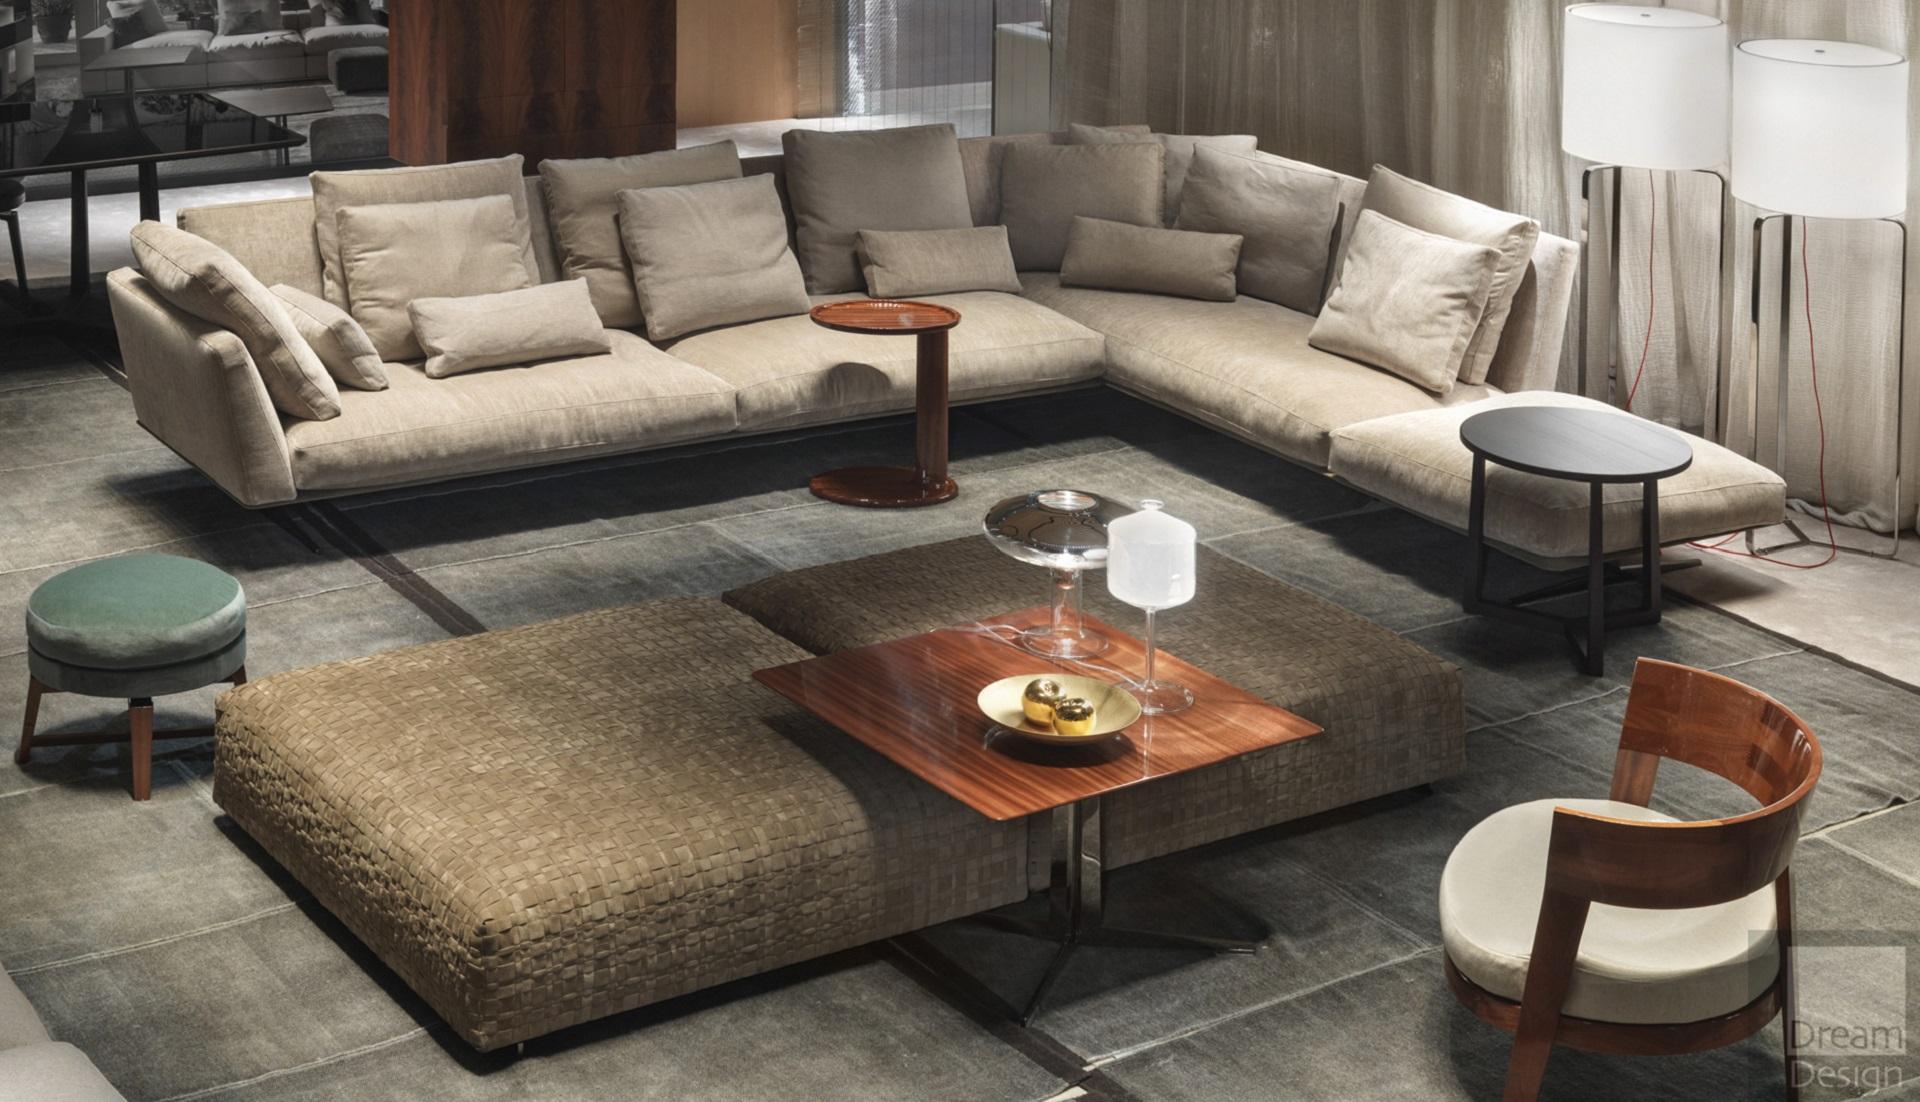 Flexform Evergreen Modular Sofa - Dream Design Interiors Ltd